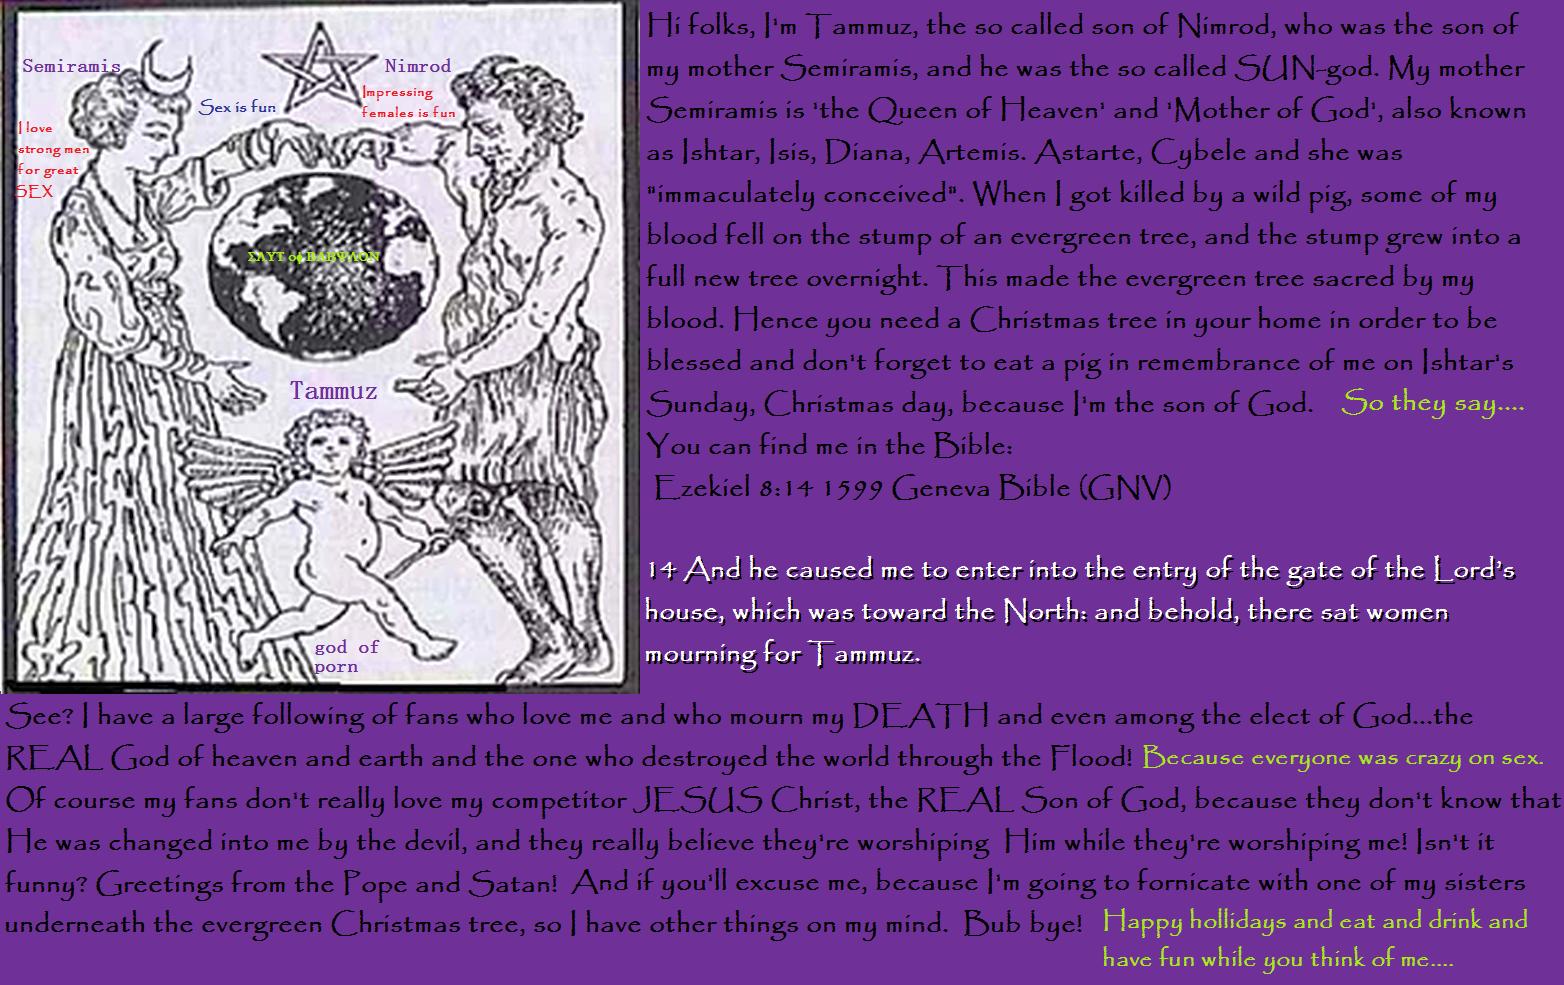 Ezekiel38Rapture: Merry Semiramis Day! The very last Christmas.....